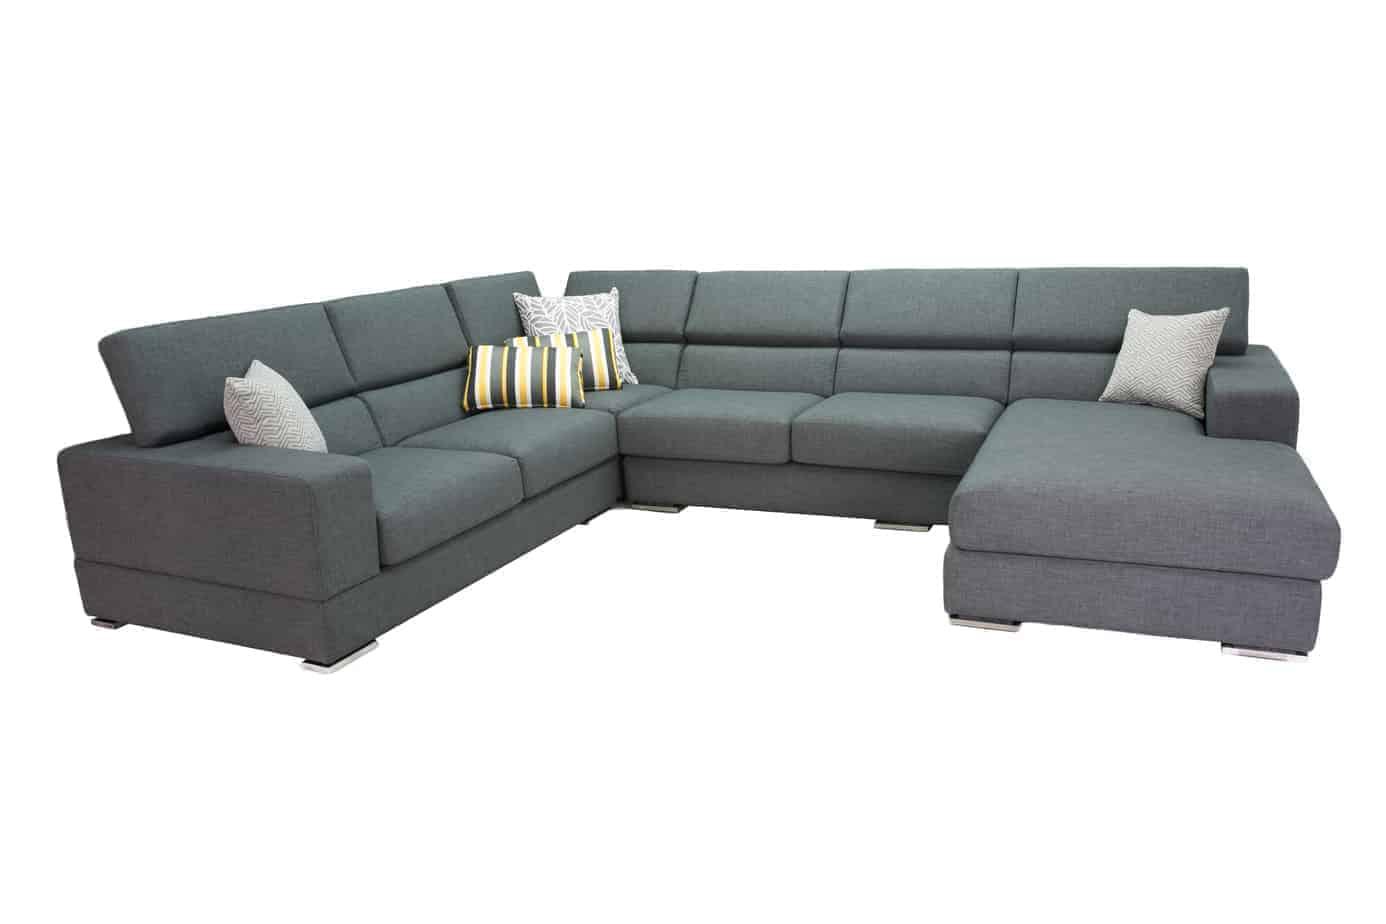 Tennyson Chaise Corner Modular Lounge 3